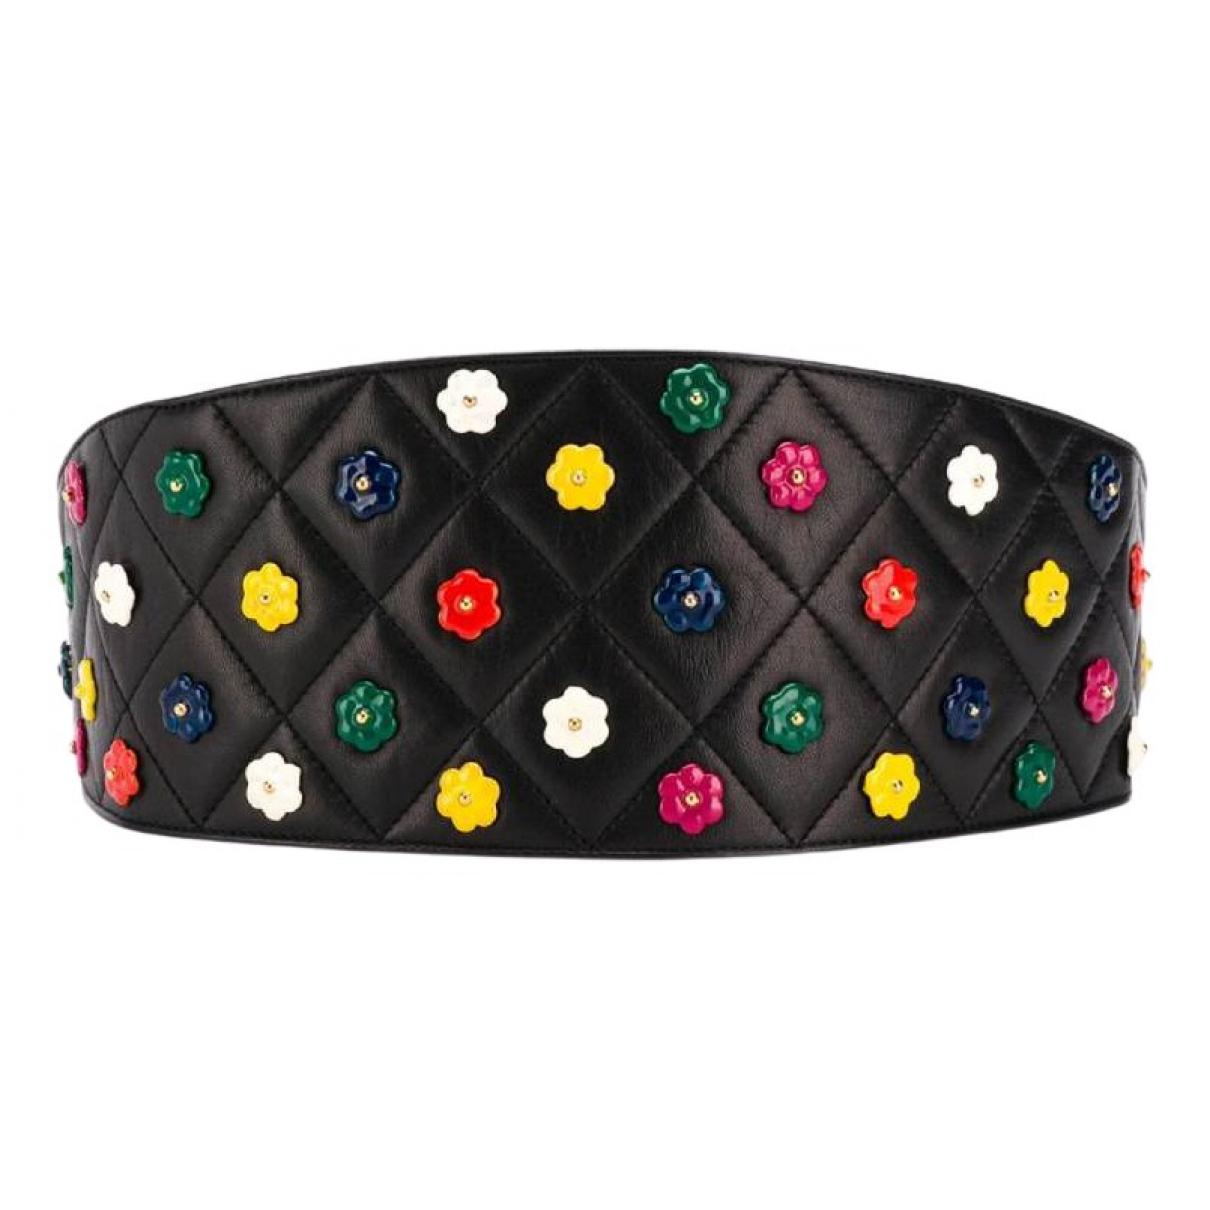 Chanel \N Black Leather belt for Women 80 cm